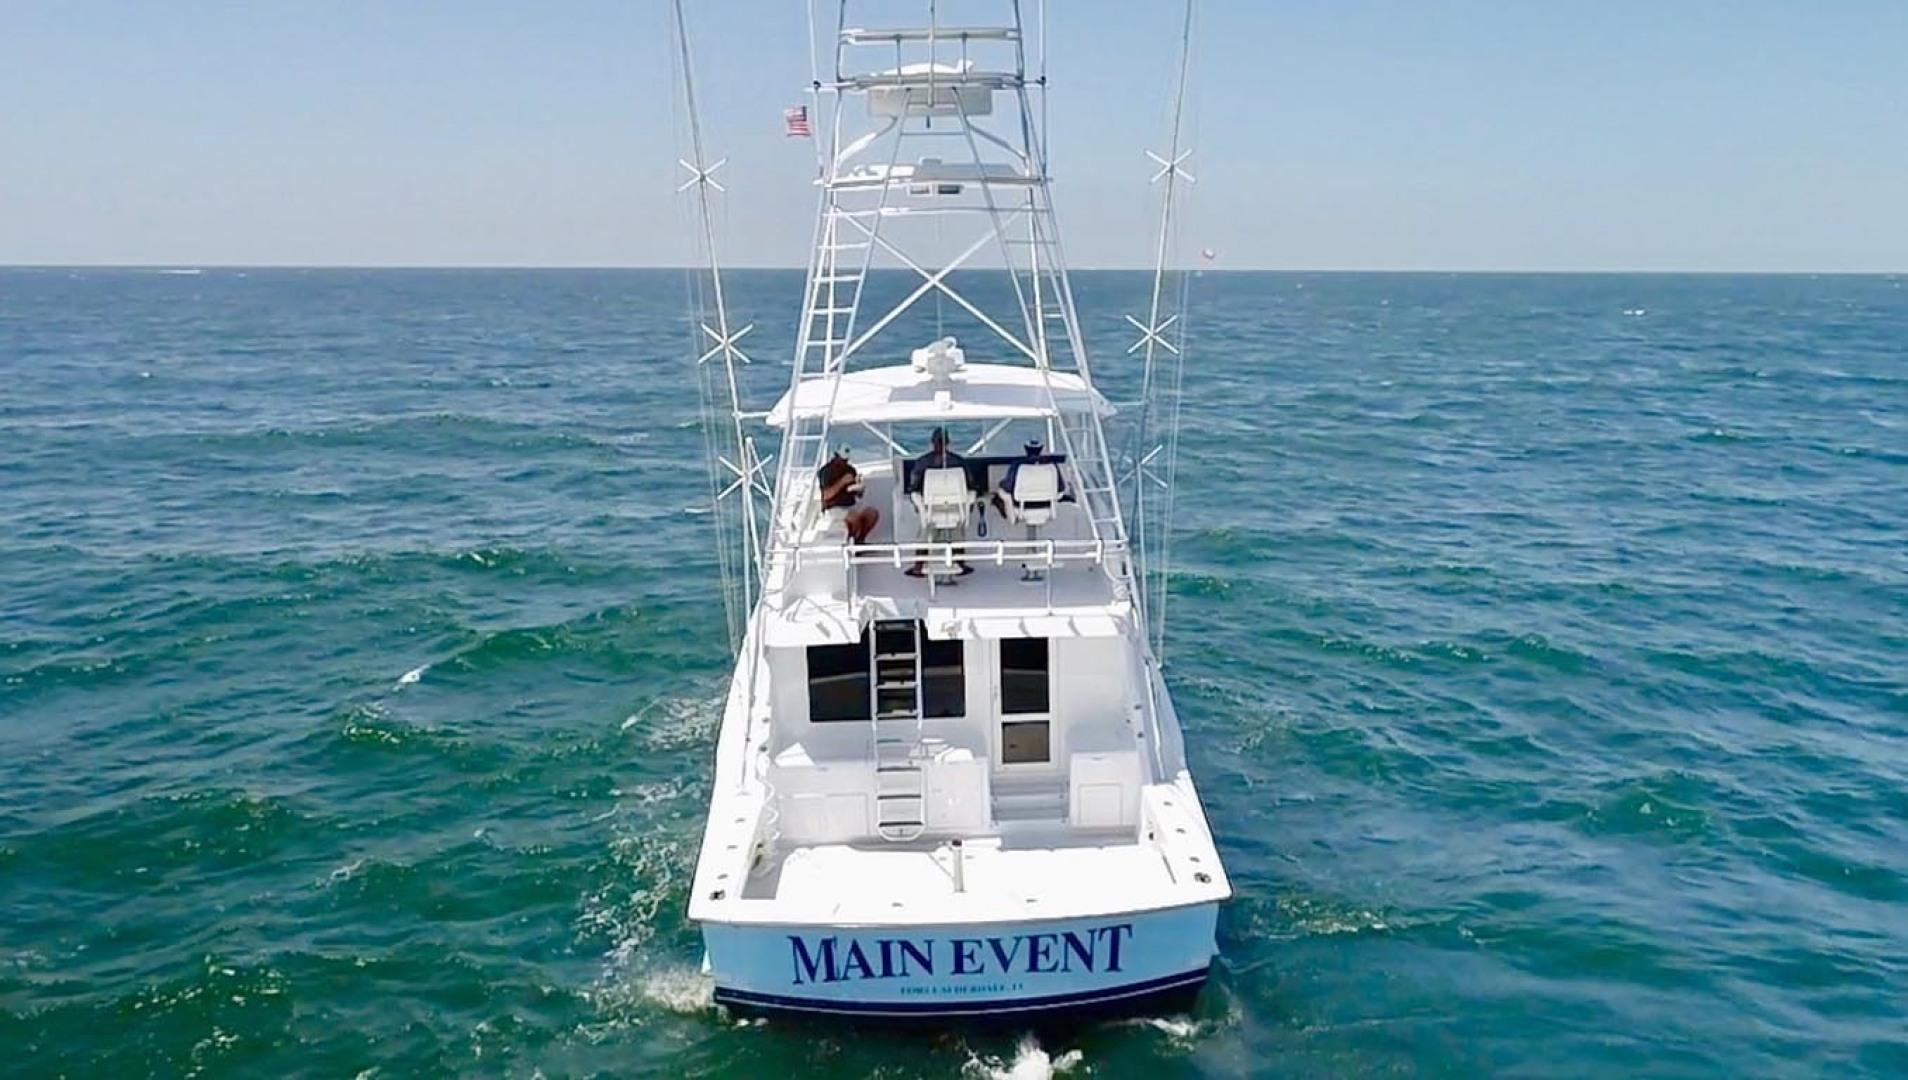 Hatteras-55 Convertible 2001-Main Event Orange Beach-Alabama-United States-Stern Profle-1454236   Thumbnail